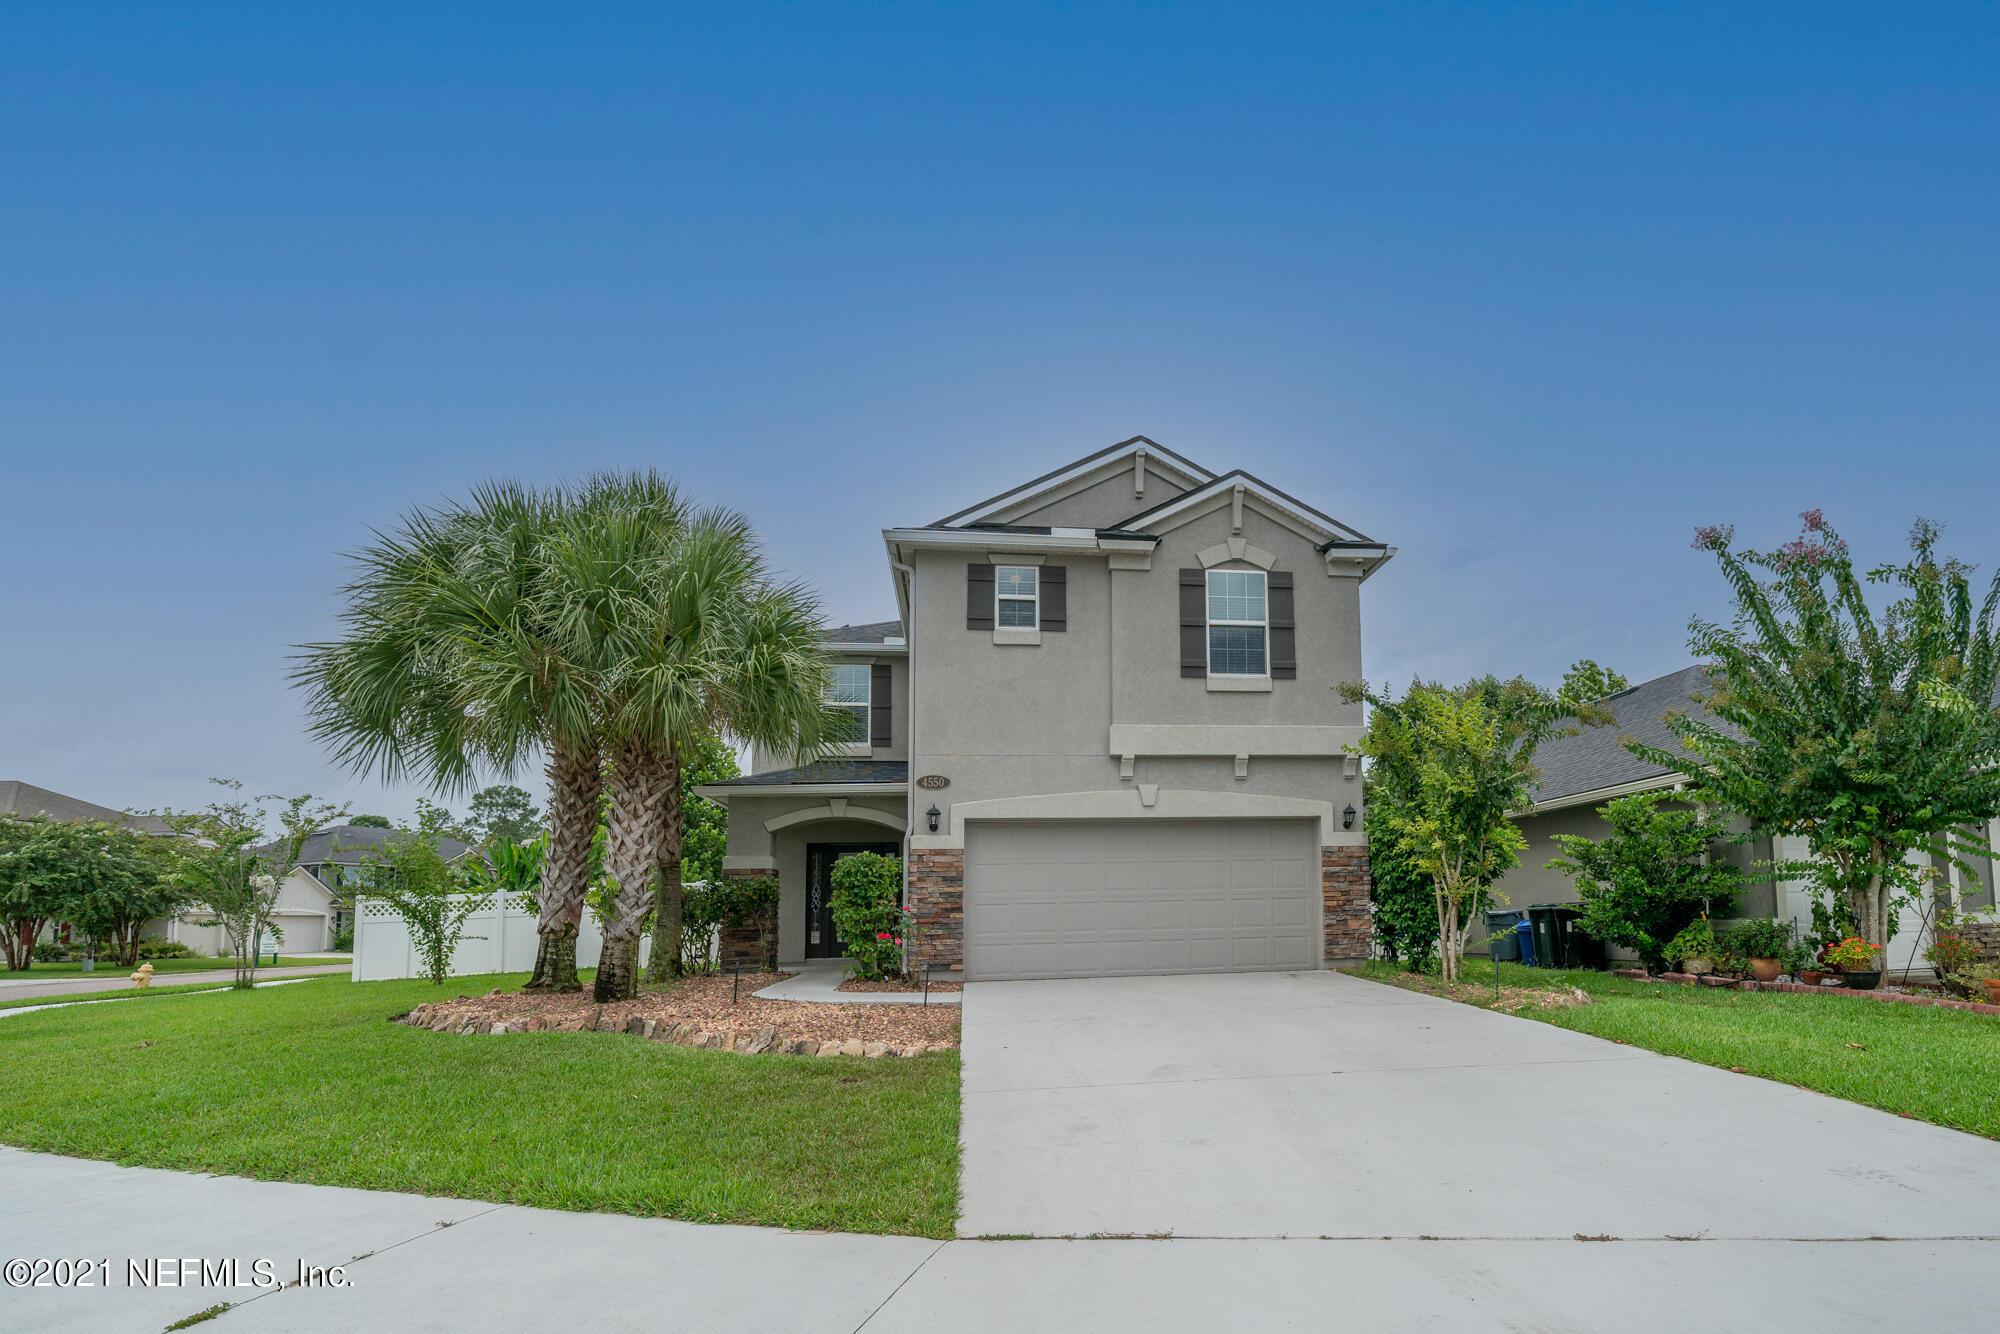 4550 PLANTATION OAKS, ORANGE PARK, FLORIDA 32065, 4 Bedrooms Bedrooms, ,2 BathroomsBathrooms,Residential,For sale,PLANTATION OAKS,1128618